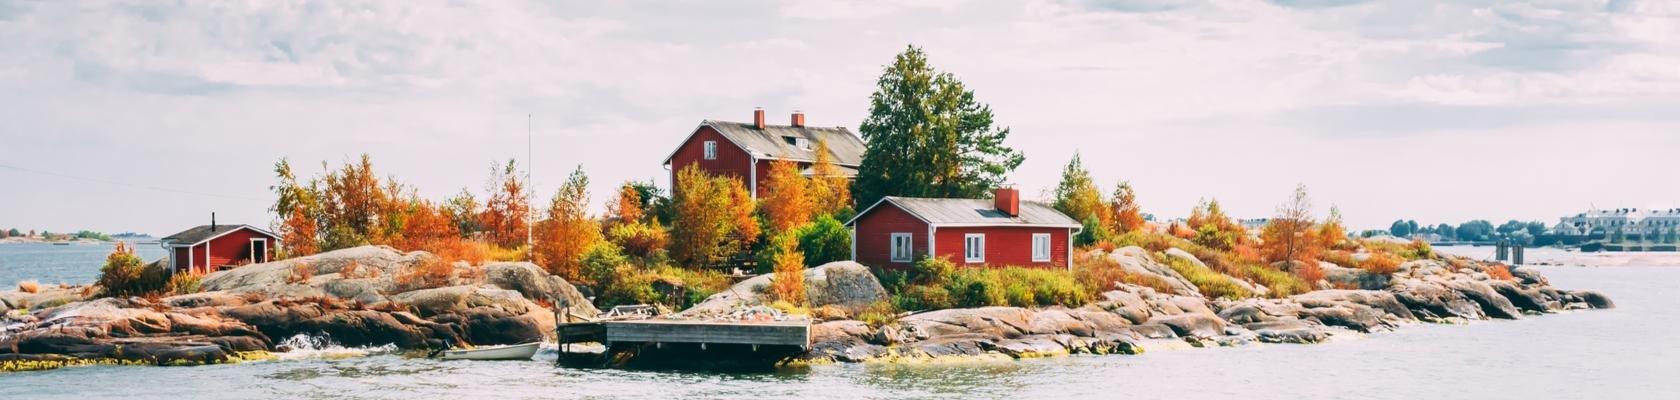 Rocky Island, Finland